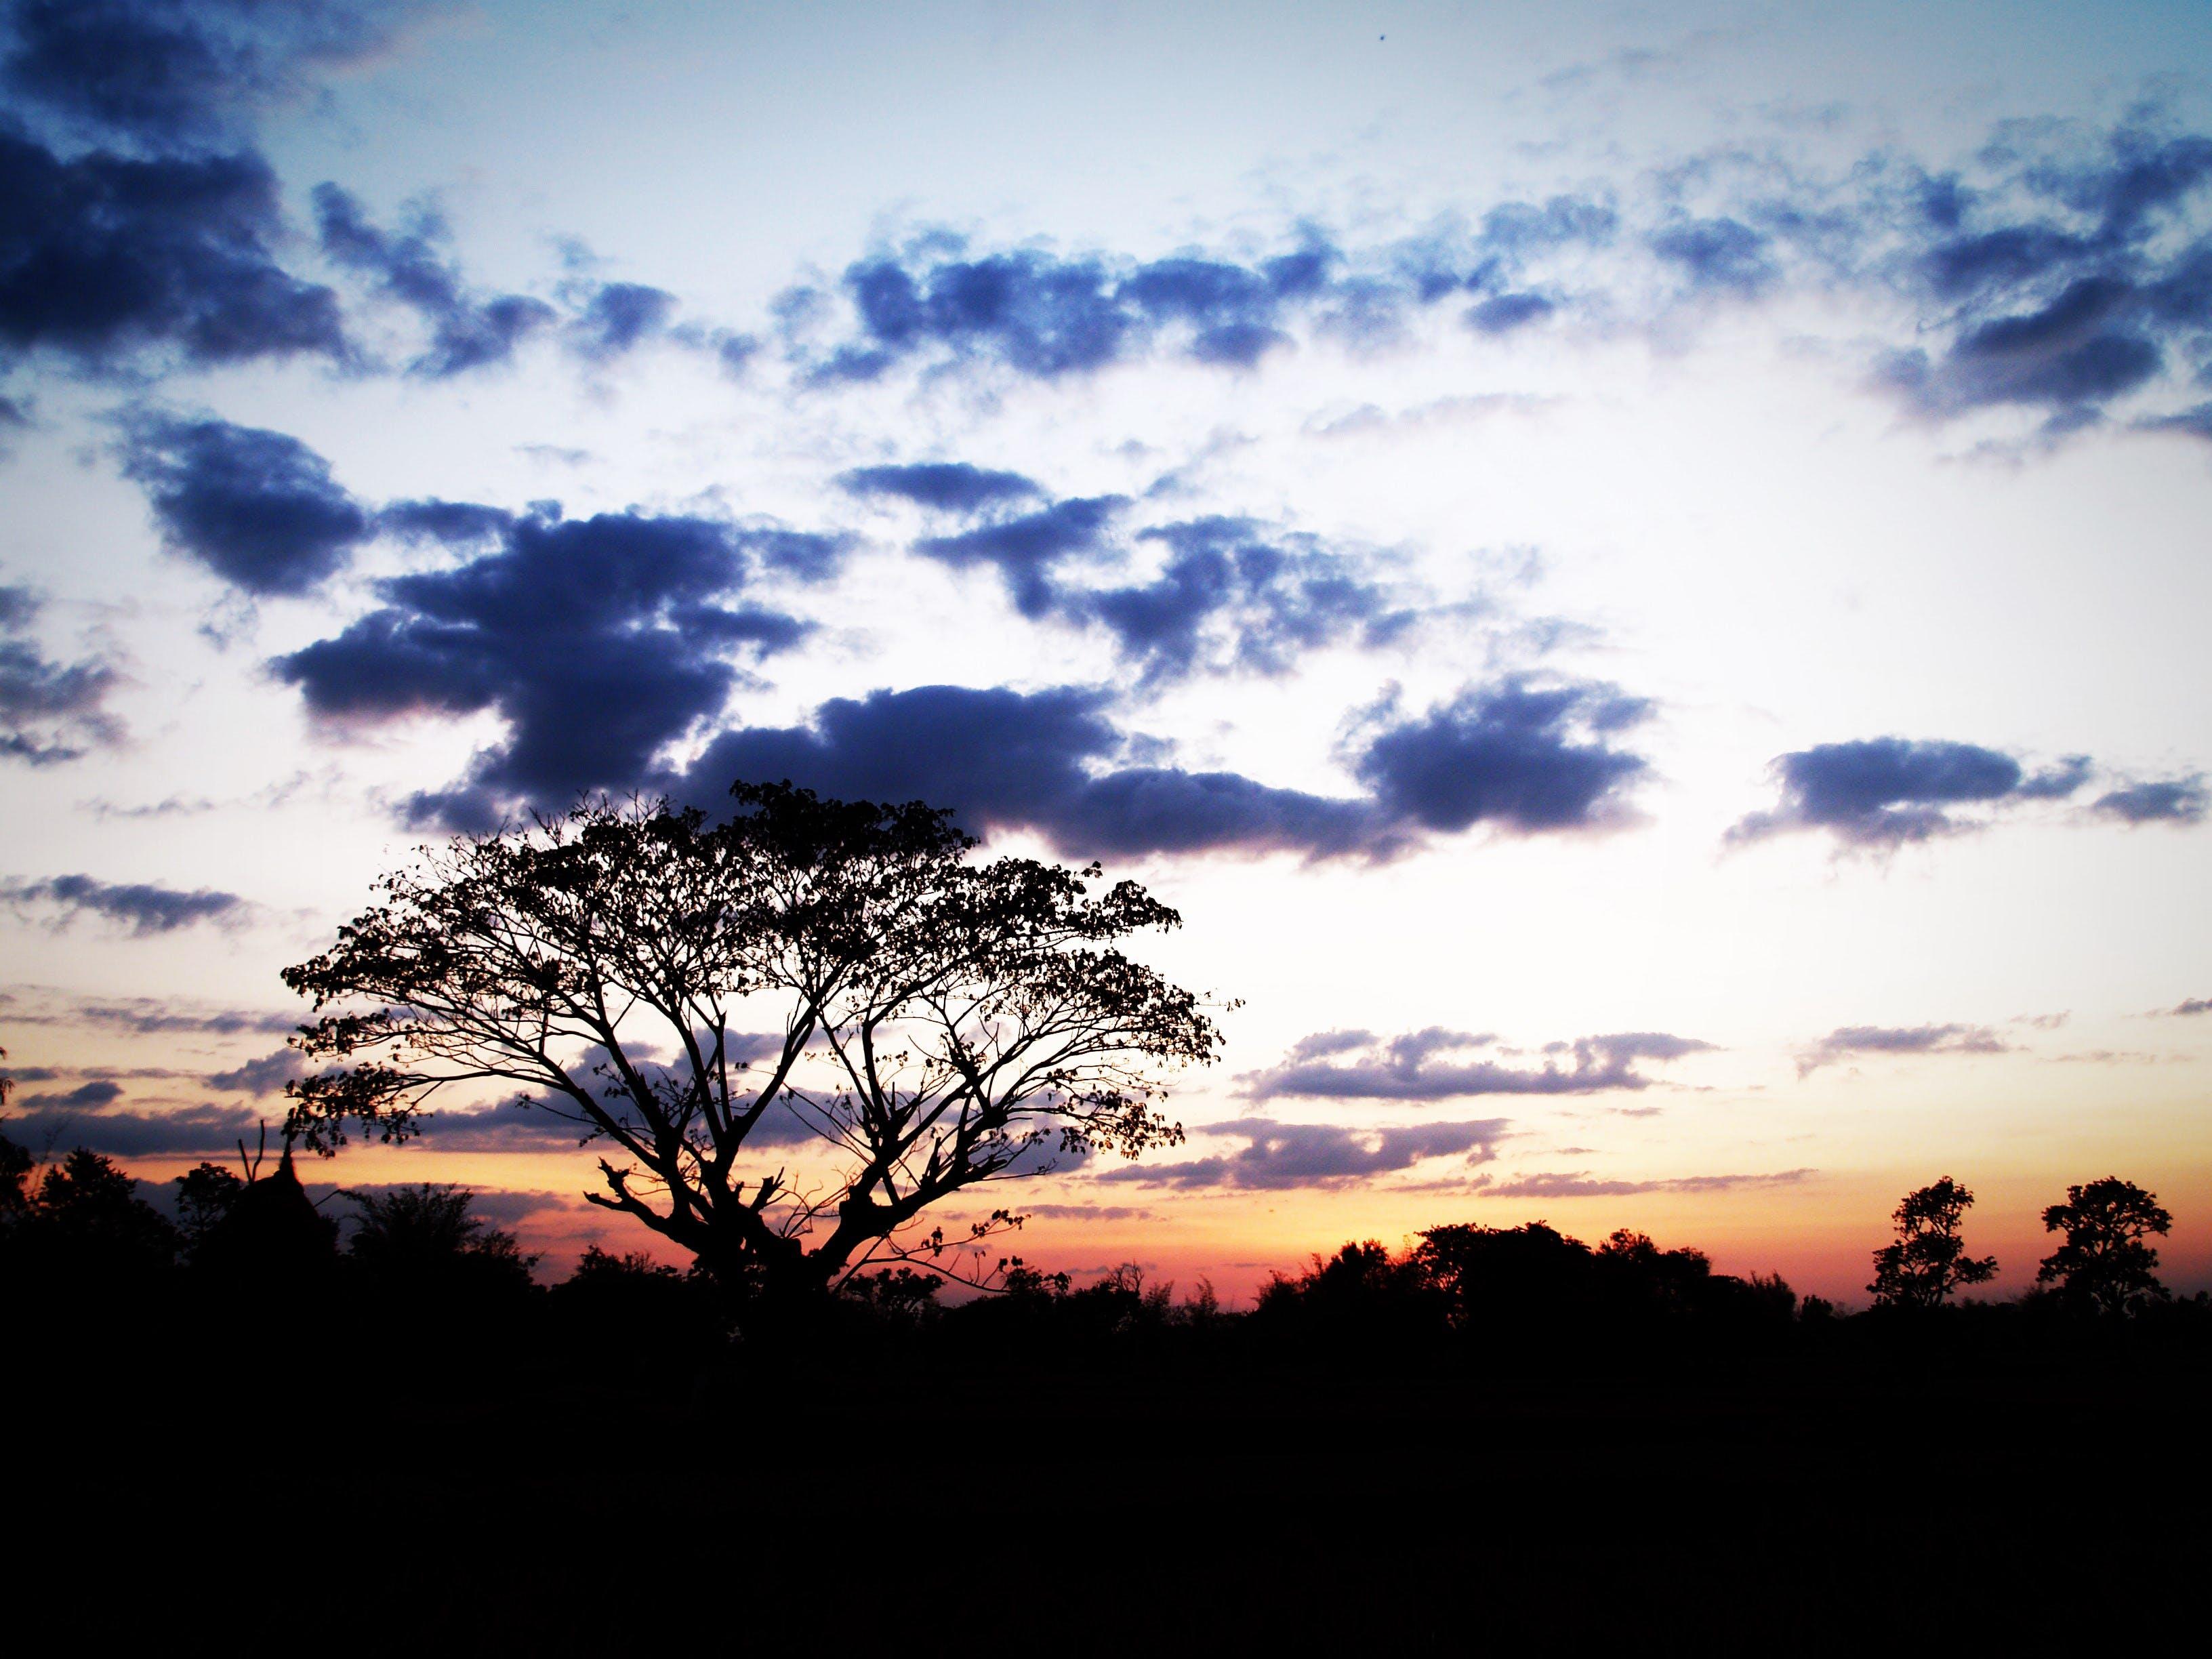 Kostenloses Stock Foto zu abend, ast, bäume, blau